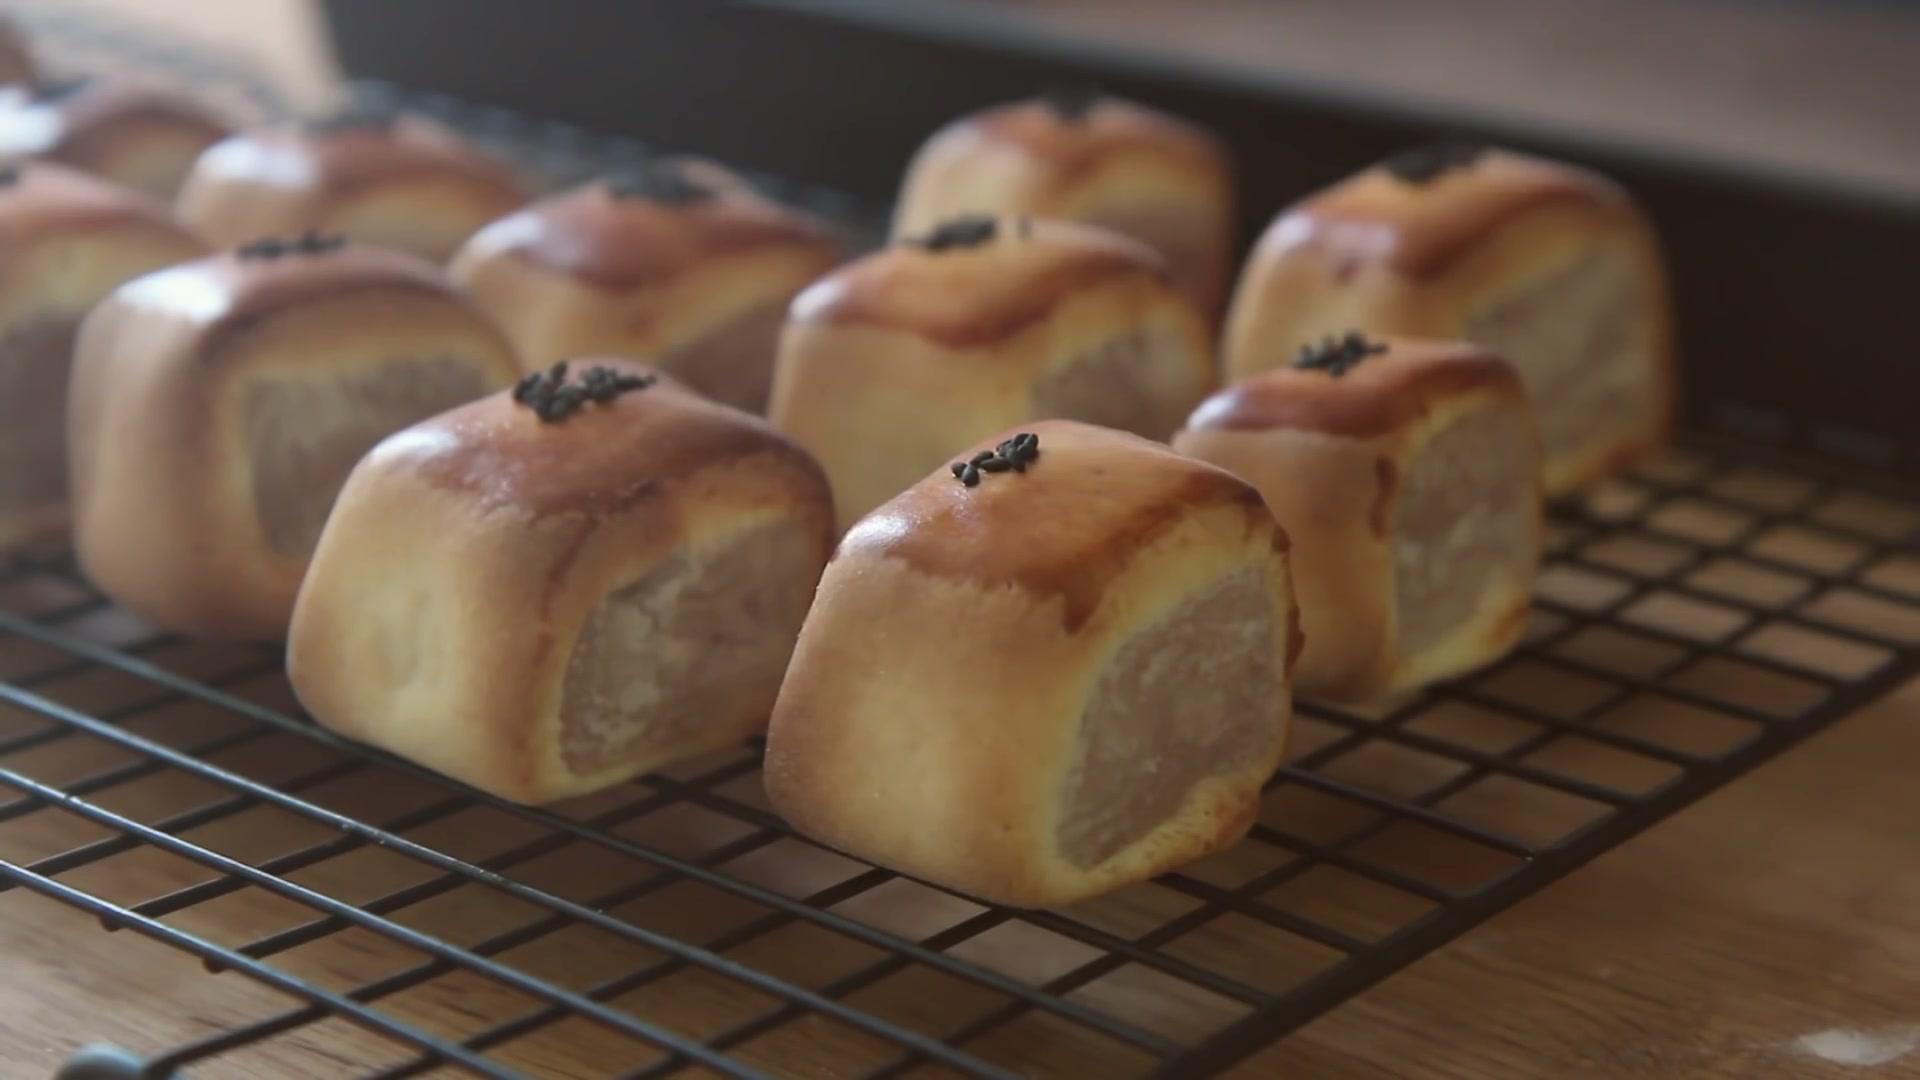 Honeykki Episode 140: Easy Manju Recipe (Sweet Buns With White Bean Paste)